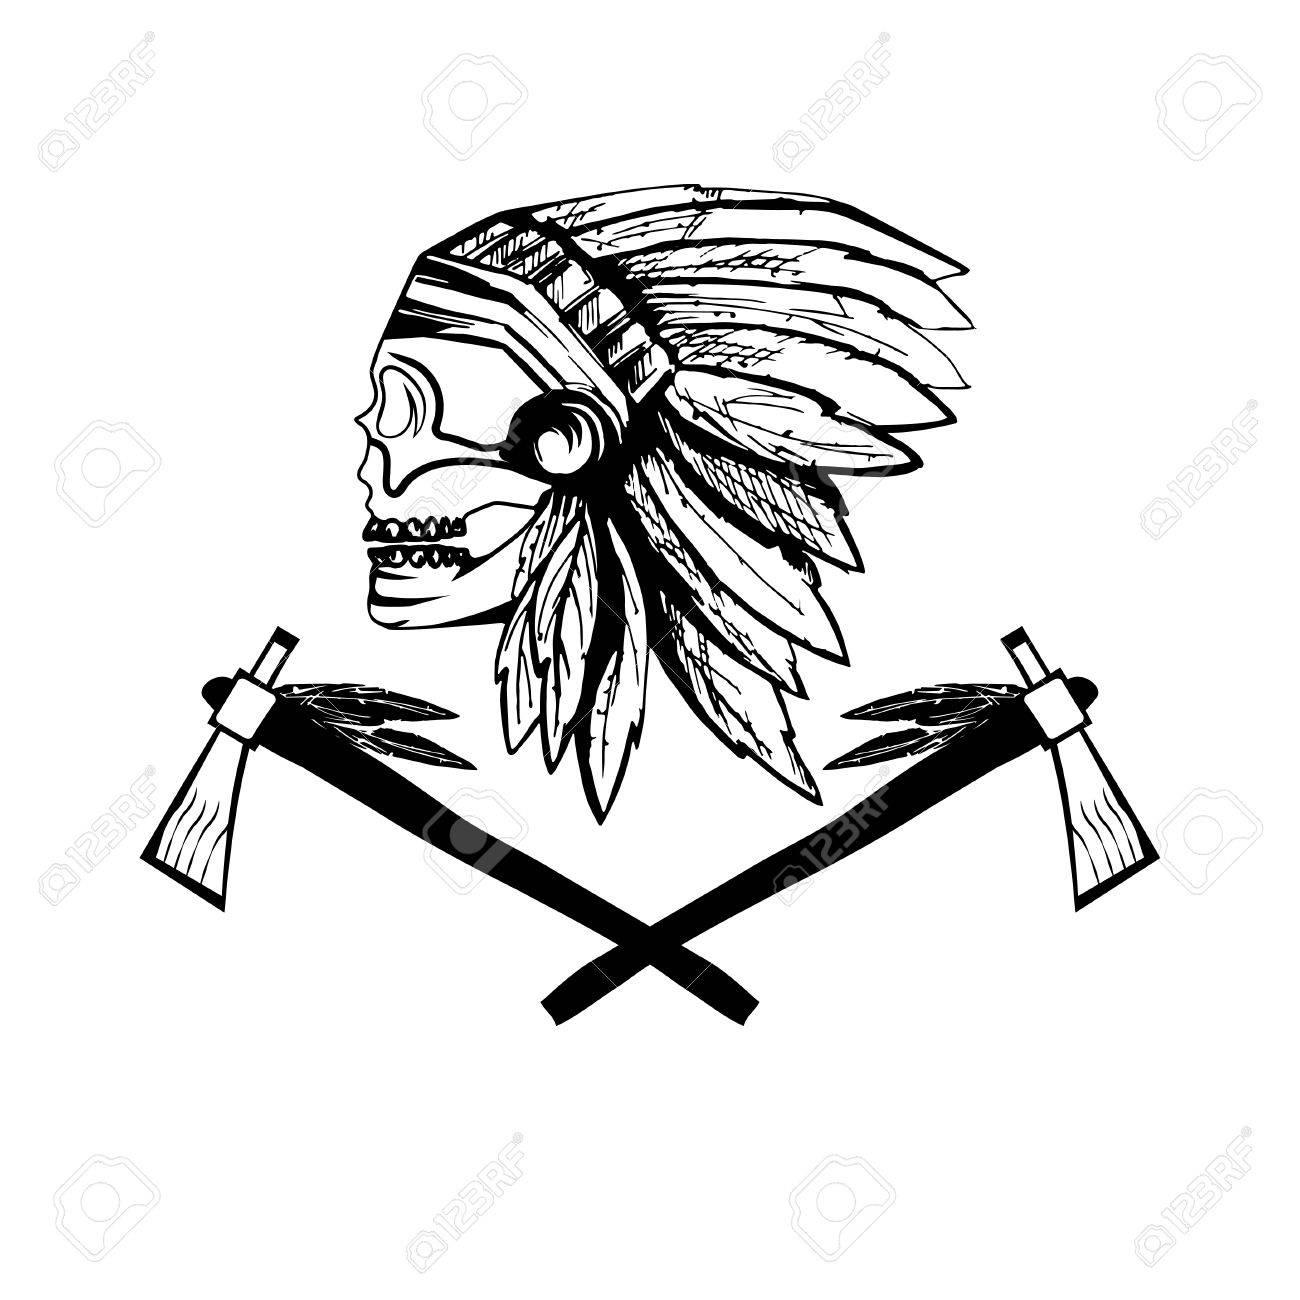 1300x1300 Native American Chief Skull In Tribal Headdress With Tomahawks